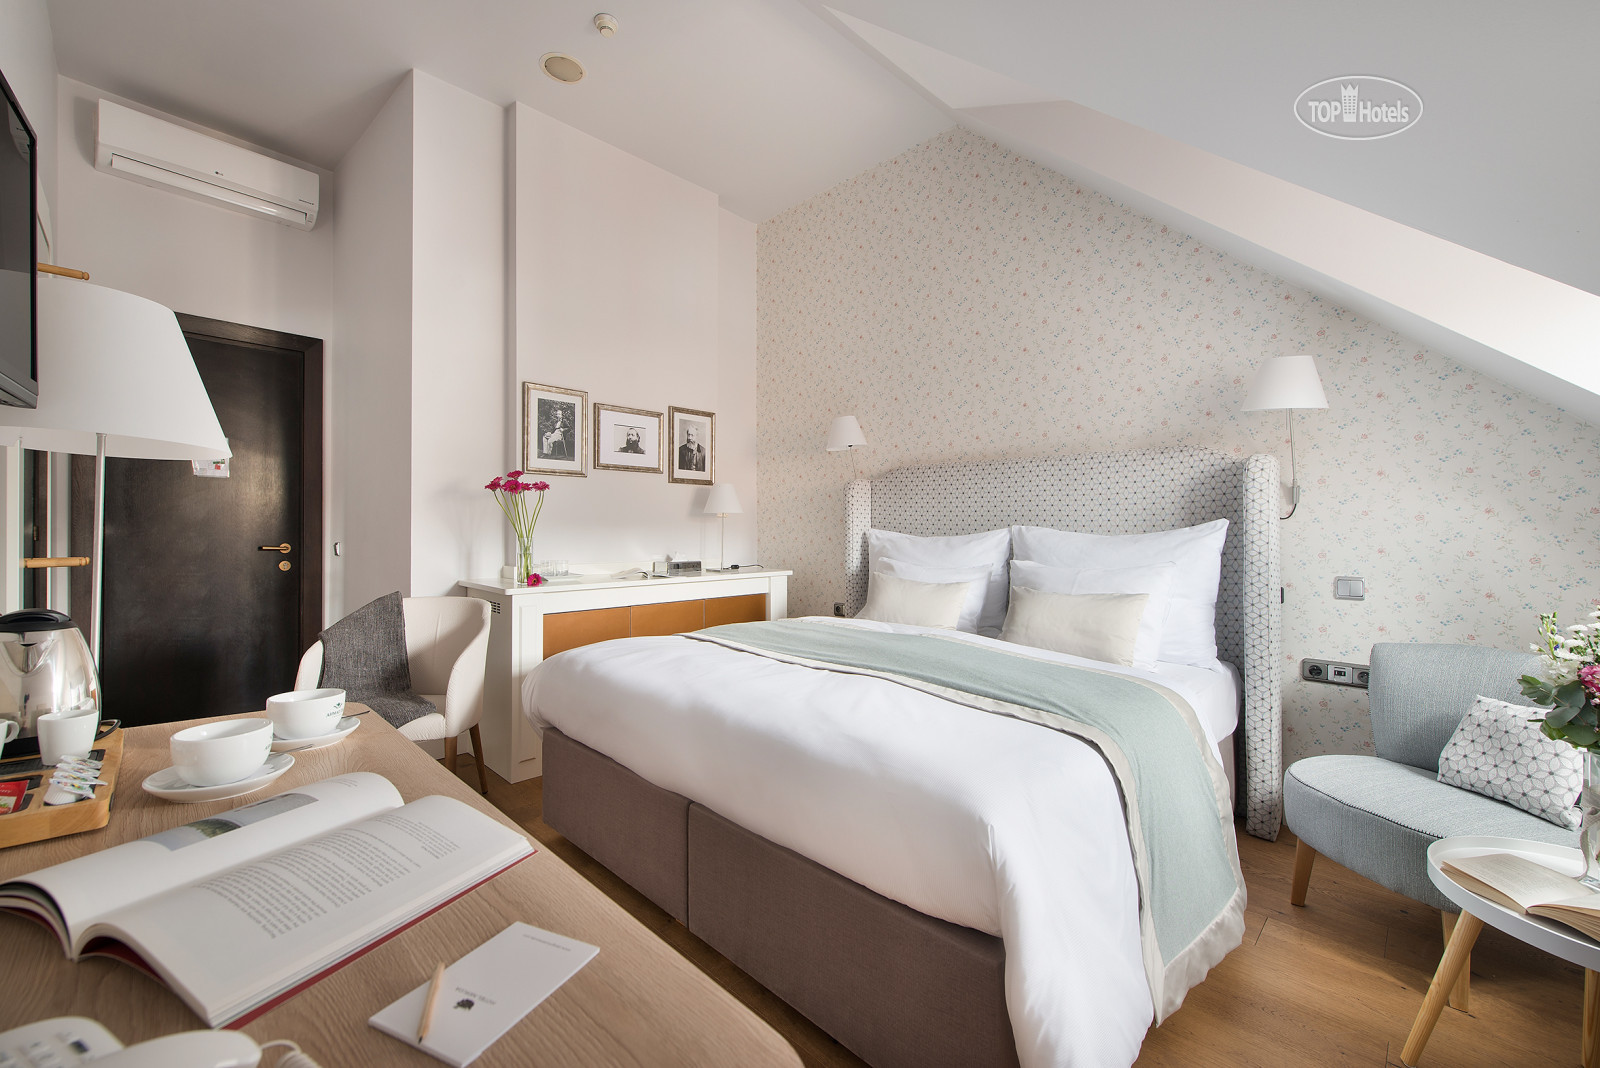 Design hotel neruda 4 for Design hotel neruda 4